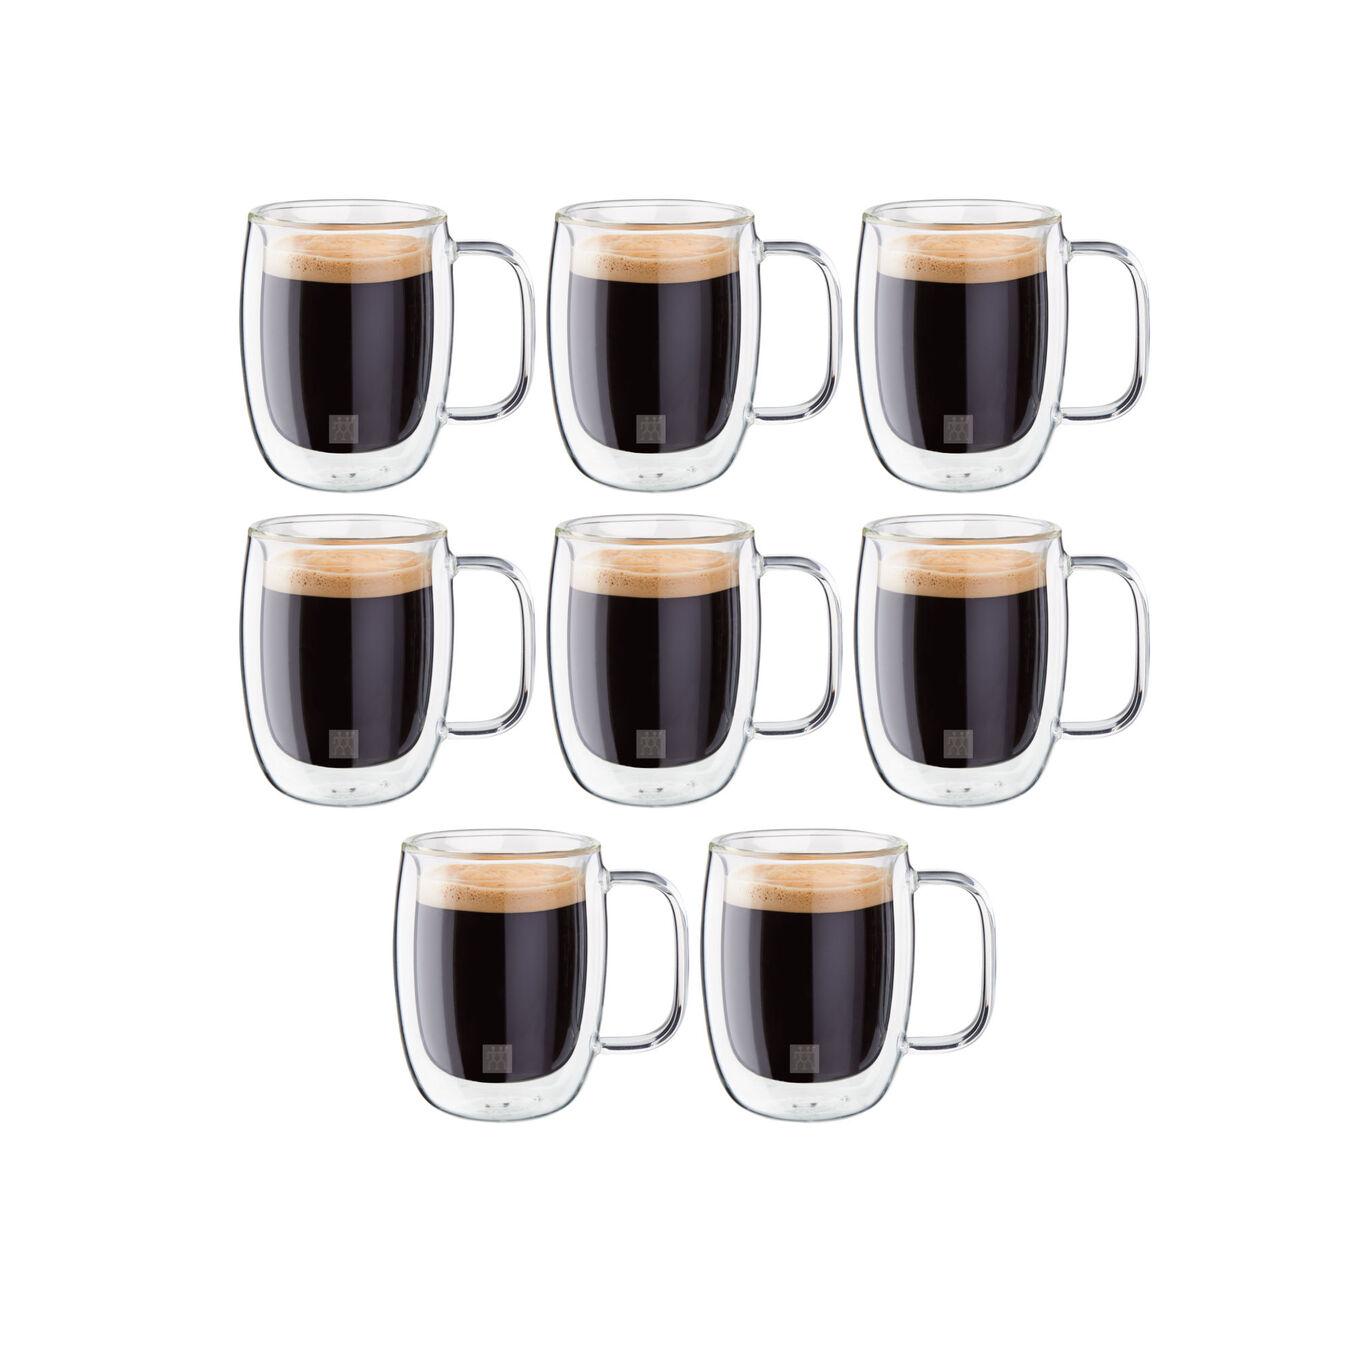 8 Piece Espresso Mug Set - Value Pack,,large 2